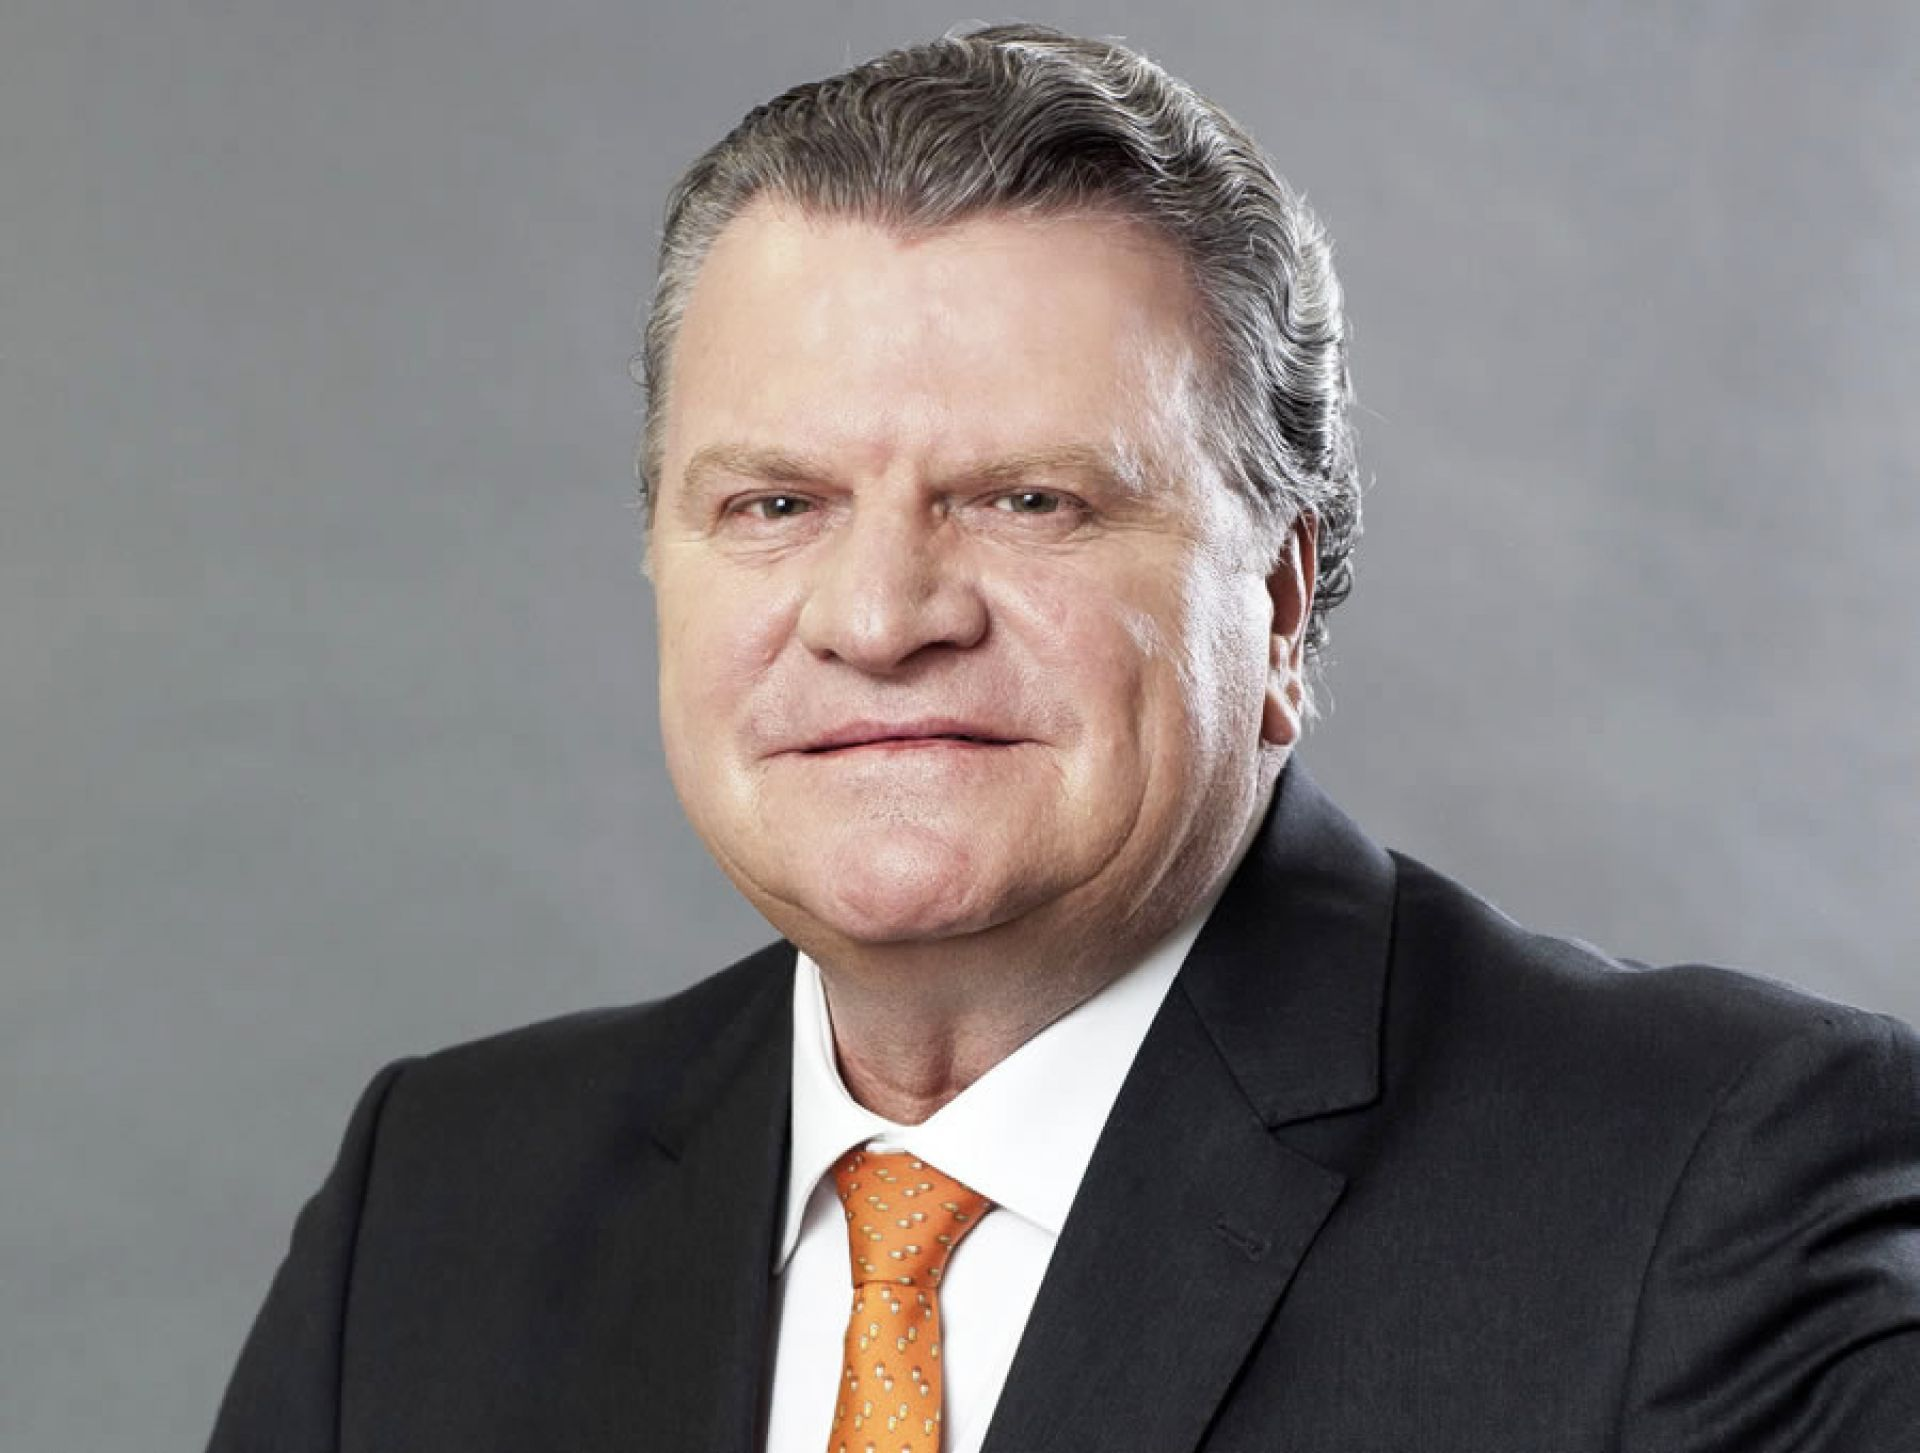 José Adalberto Ferrara - Presidente da Tokio Marine